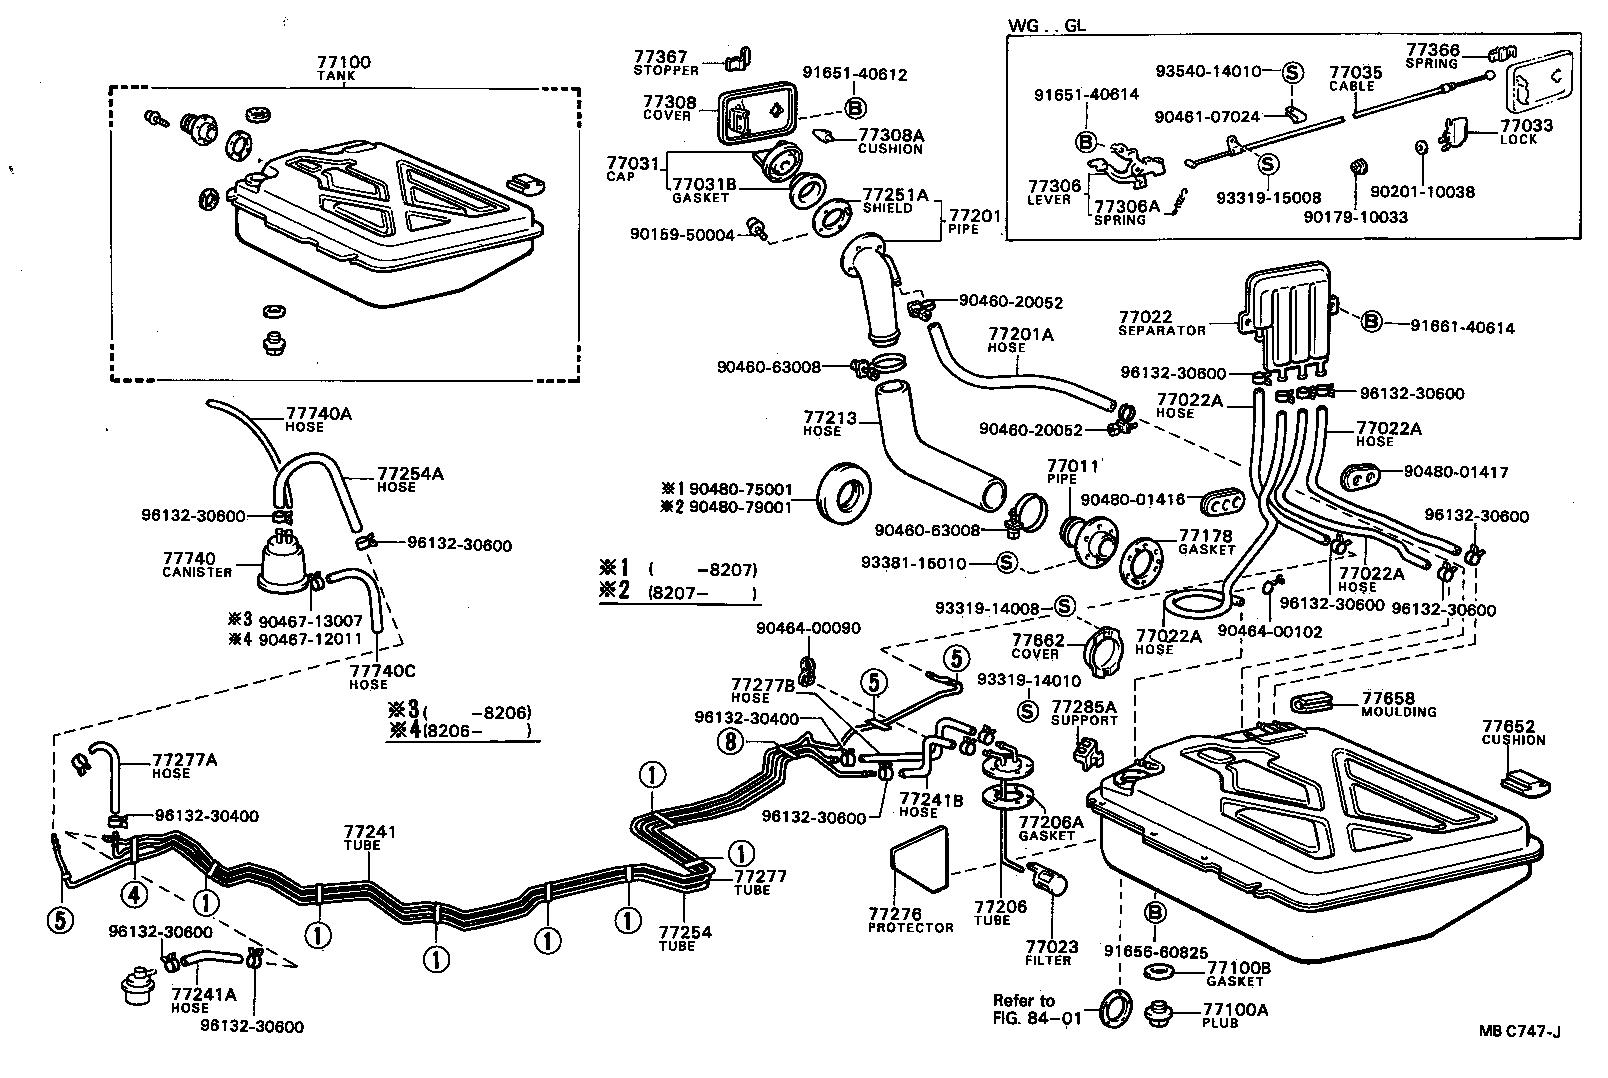 1997 toyota corolla fuel tank